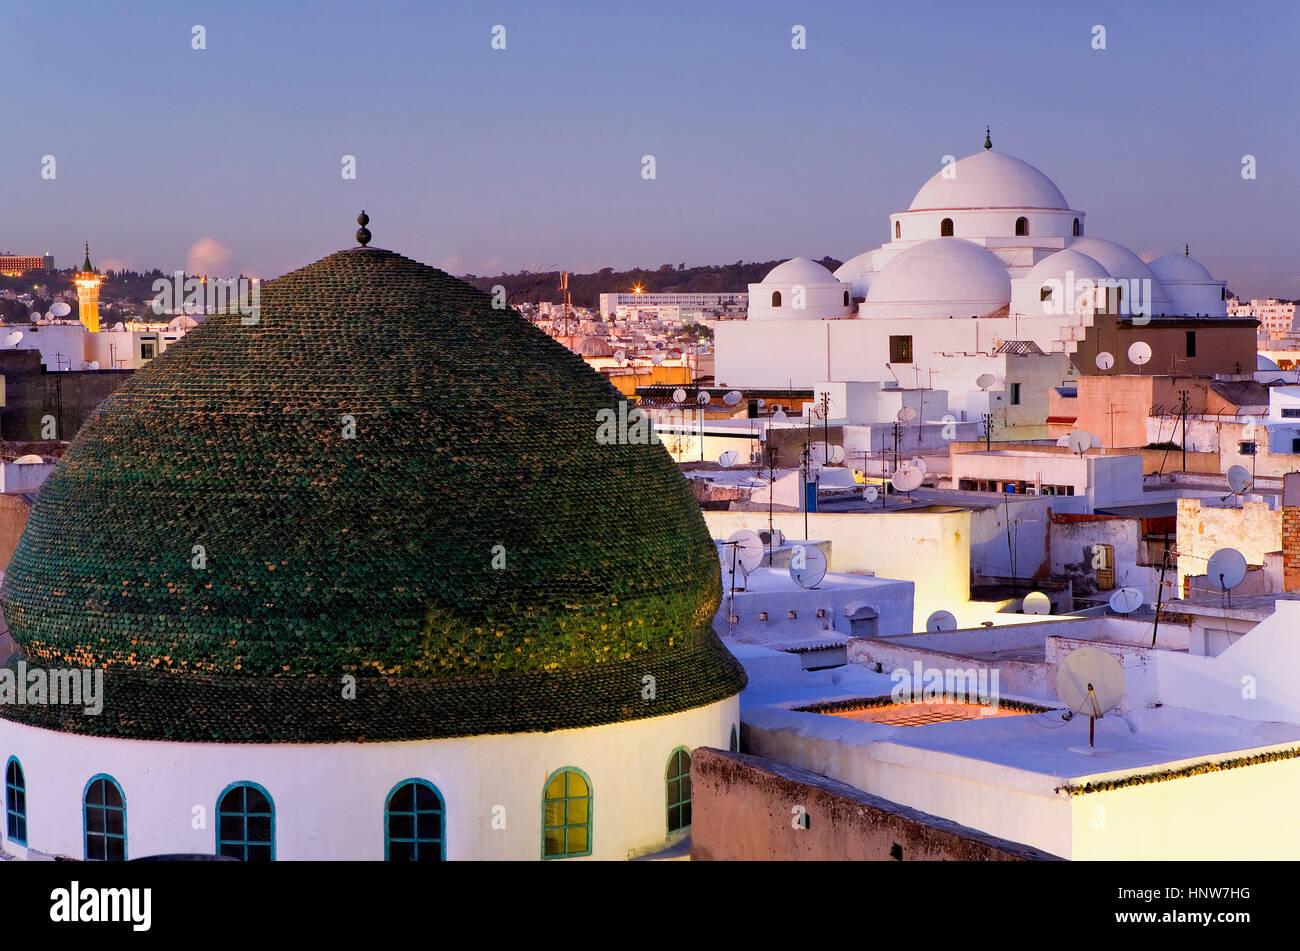 Túnez: ciudad de Túnez.horizonte de Túnez. a la derecha, la mezquita Sidi Mahrez. a la izquierda, Imagen De Stock